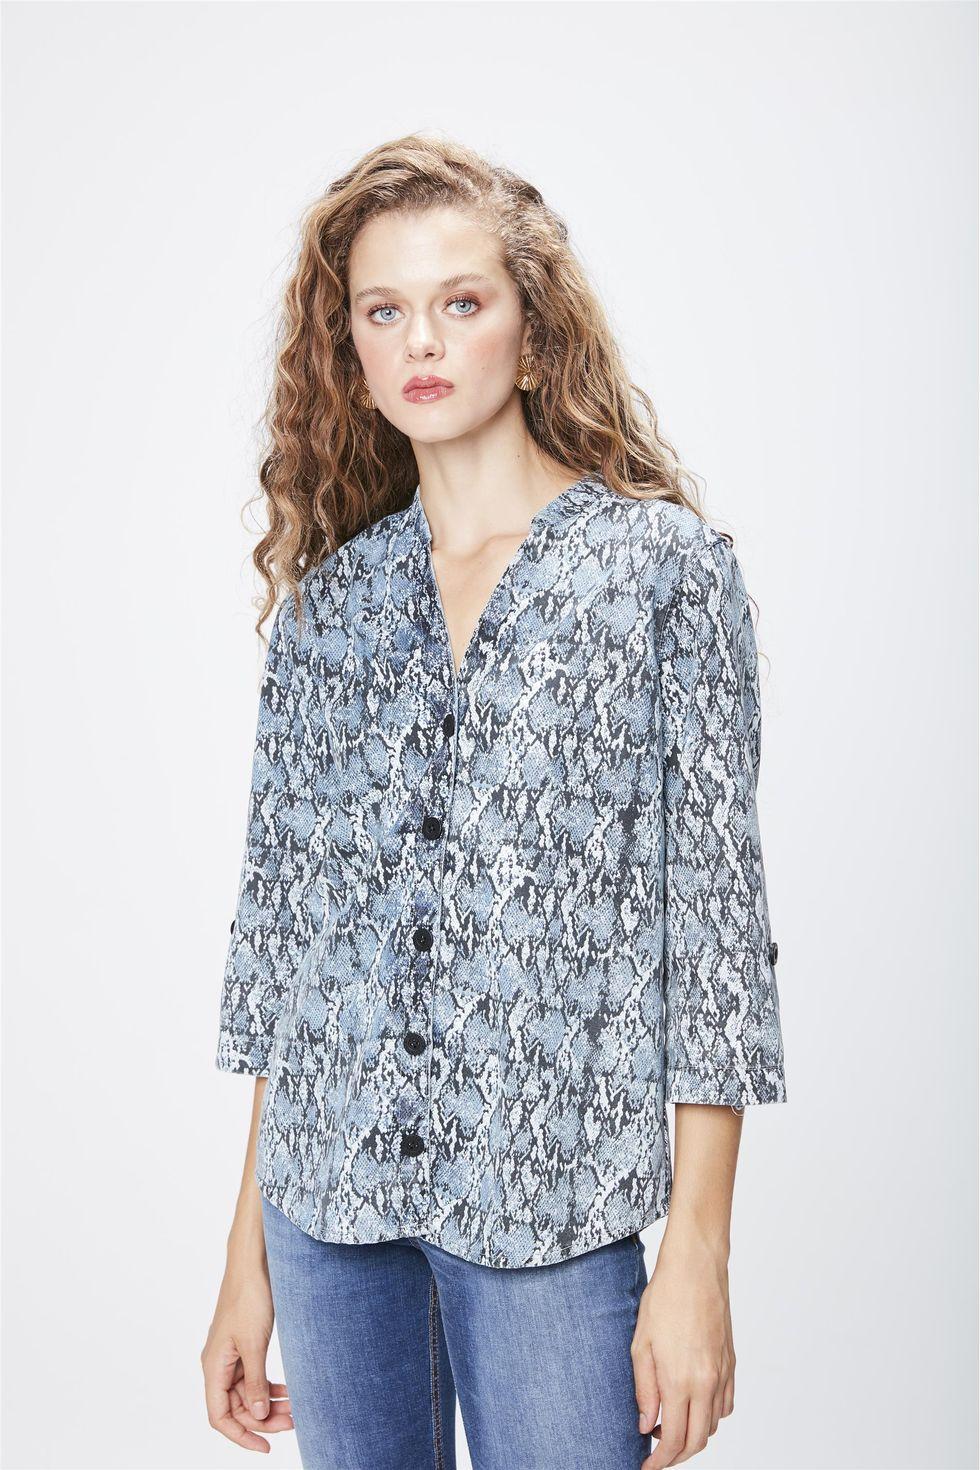 Camisa-Jeans-Animal-Print-Feminina-Frente--